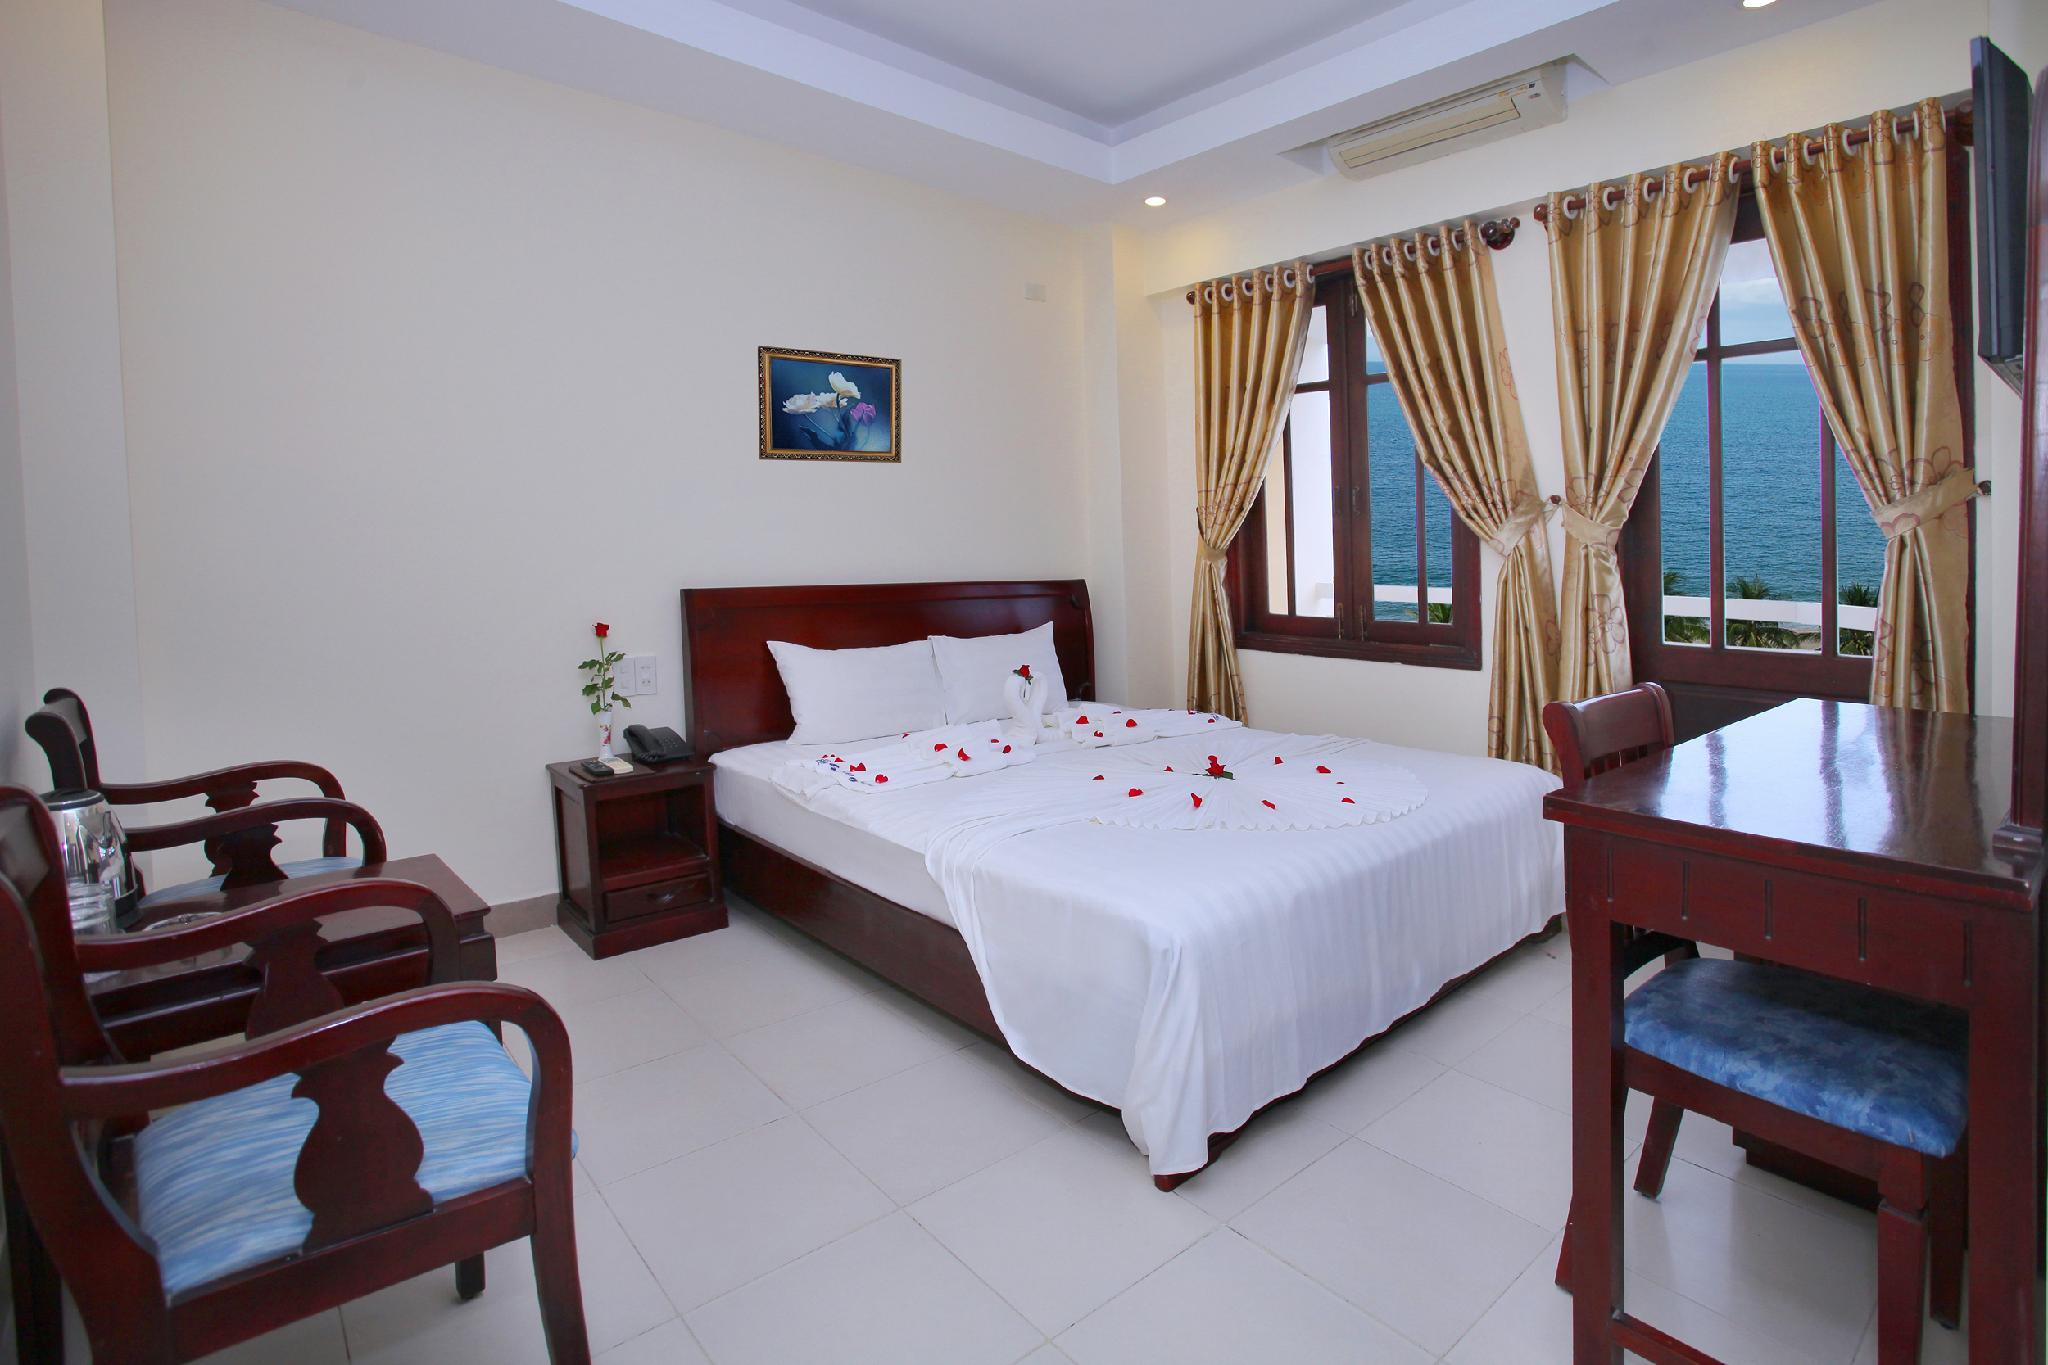 Moonlight Hotel, Nha Trang